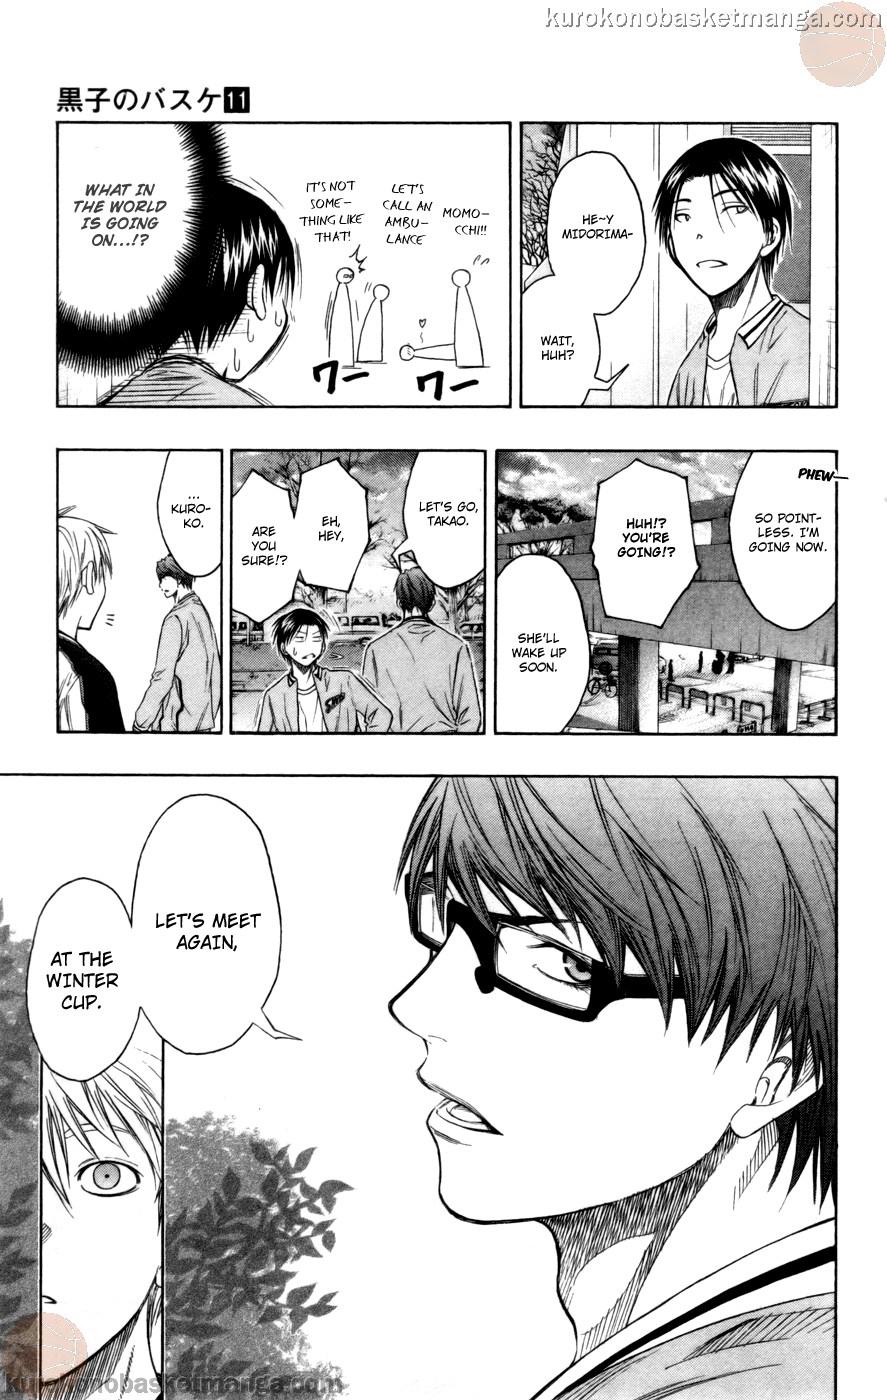 Kuroko no Basket Manga Chapter 93 - Image 17